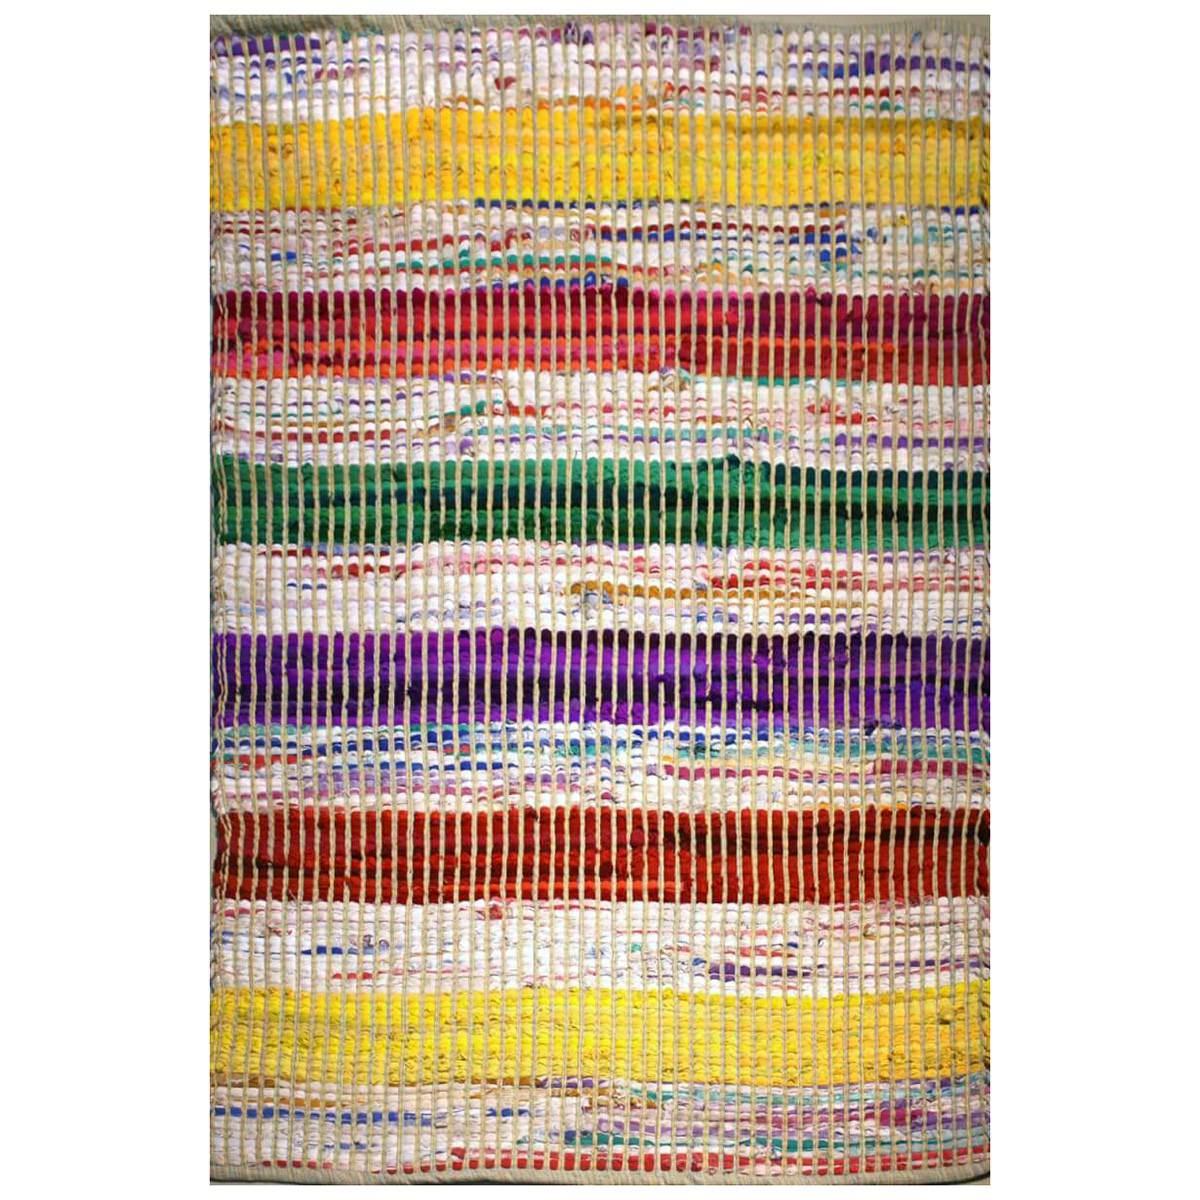 Lulu Recycled Fabric Chindi Rug, 225x155cm